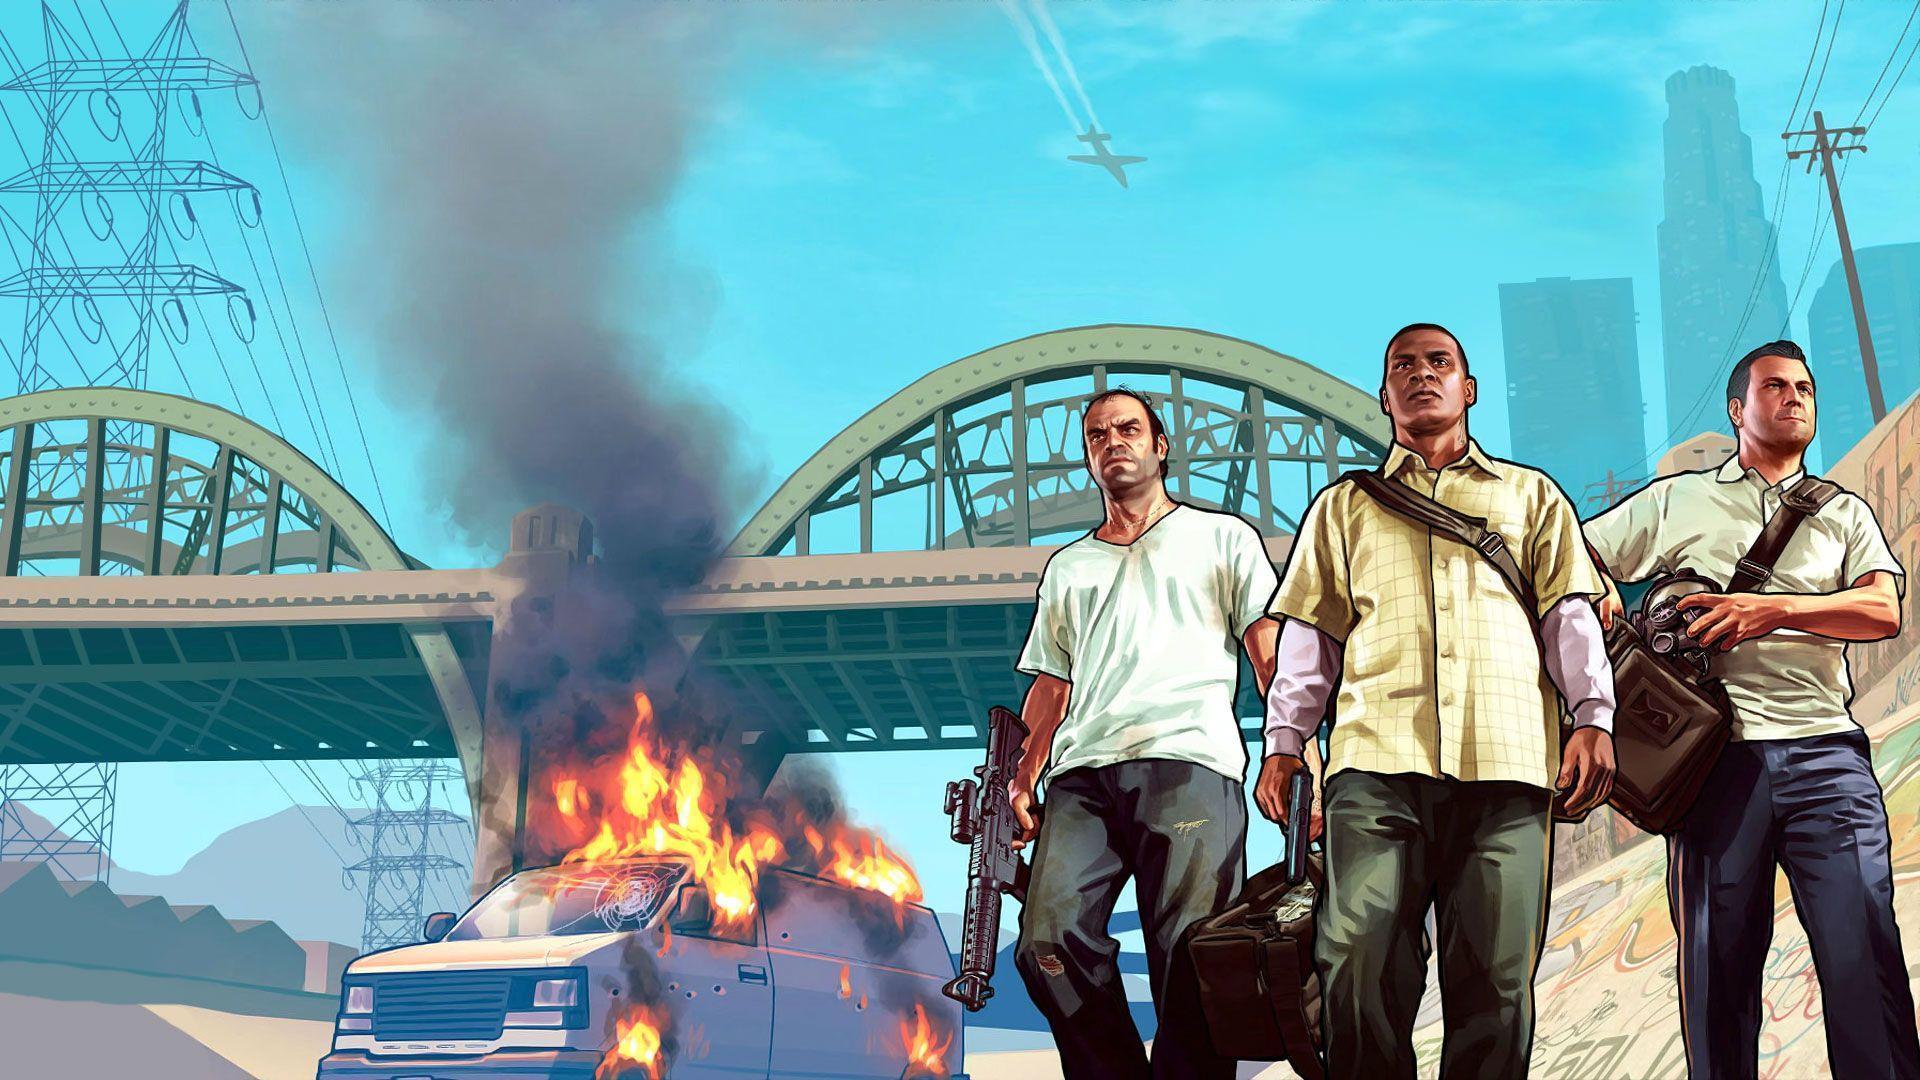 Grand Theft Auto Wallpaper Girl Grand Theft Auto V Wallpapers Wallpaper Cave